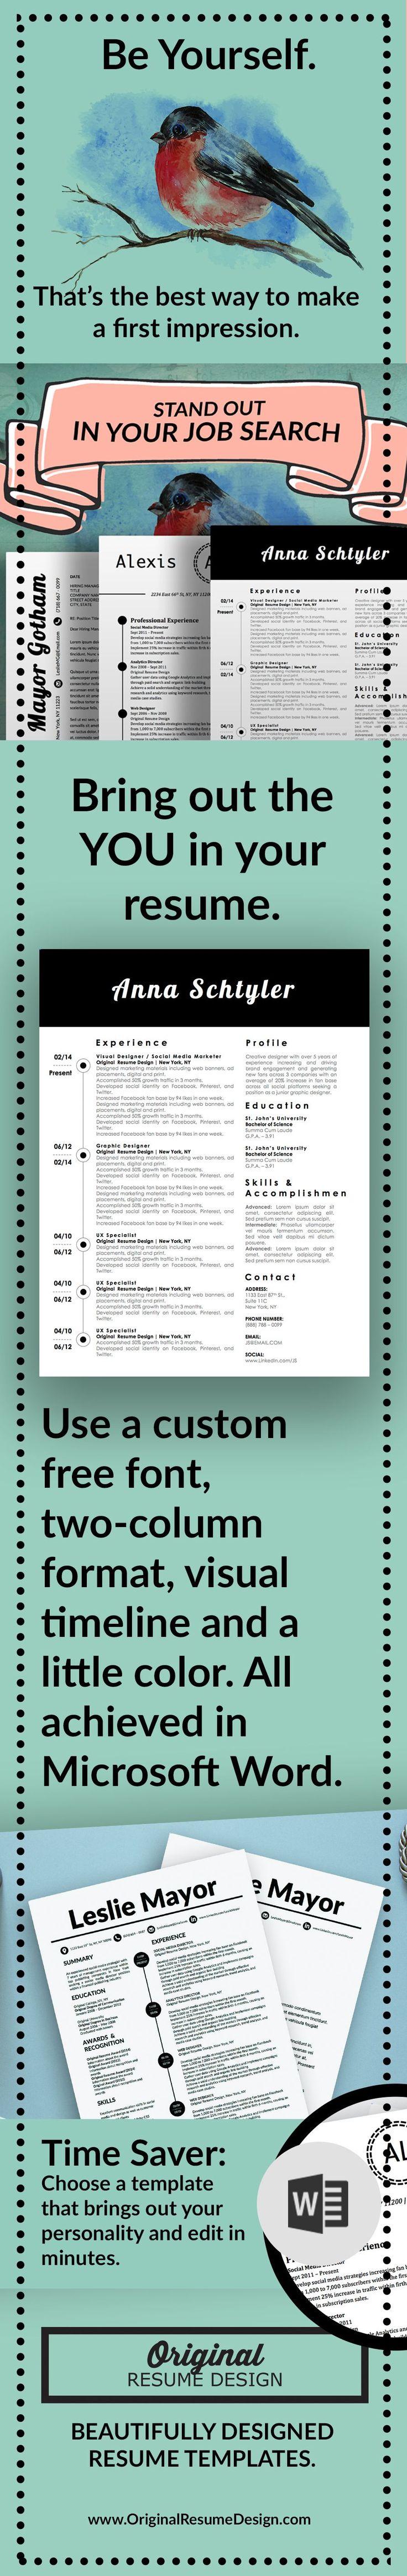 52 best Best Resume and CV Design images on Pinterest   Resume ...